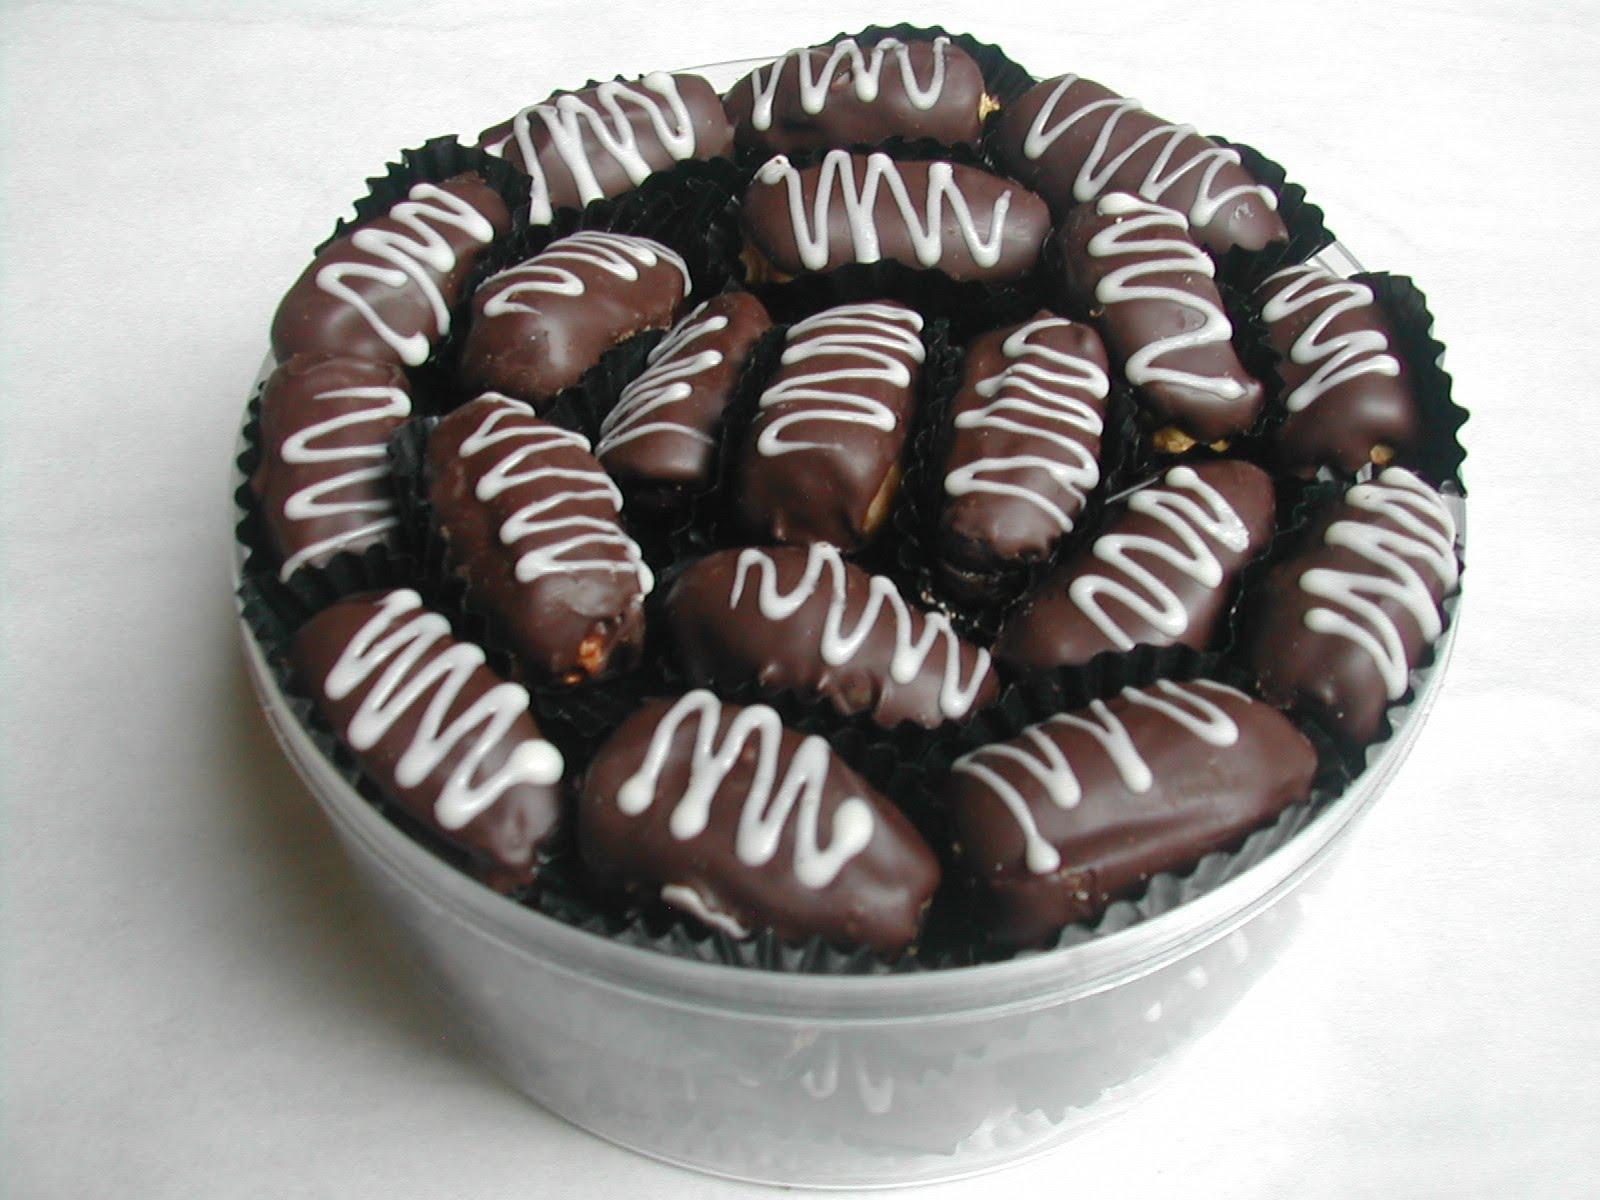 Resep Kue Kering Nastar Coklat